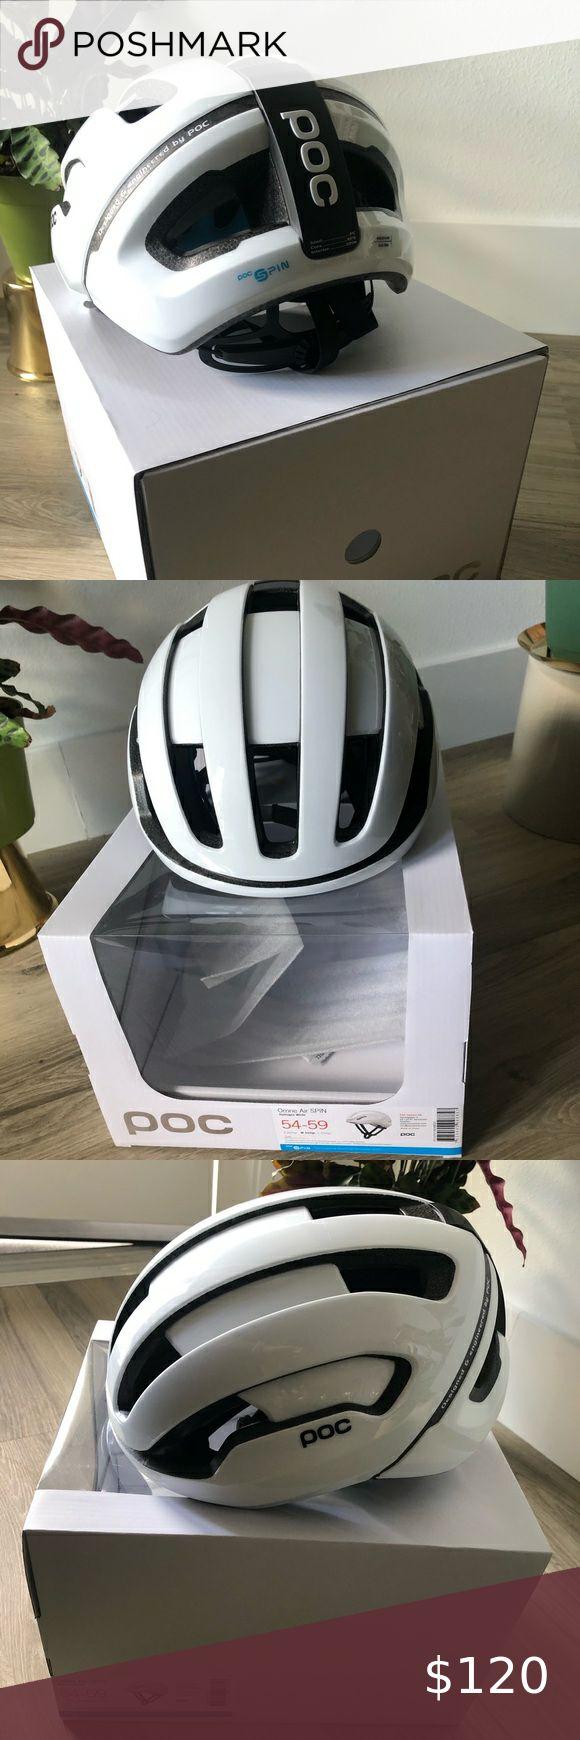 POC OMNE AIR SPIN HELMET size medium in 2020 Helmet